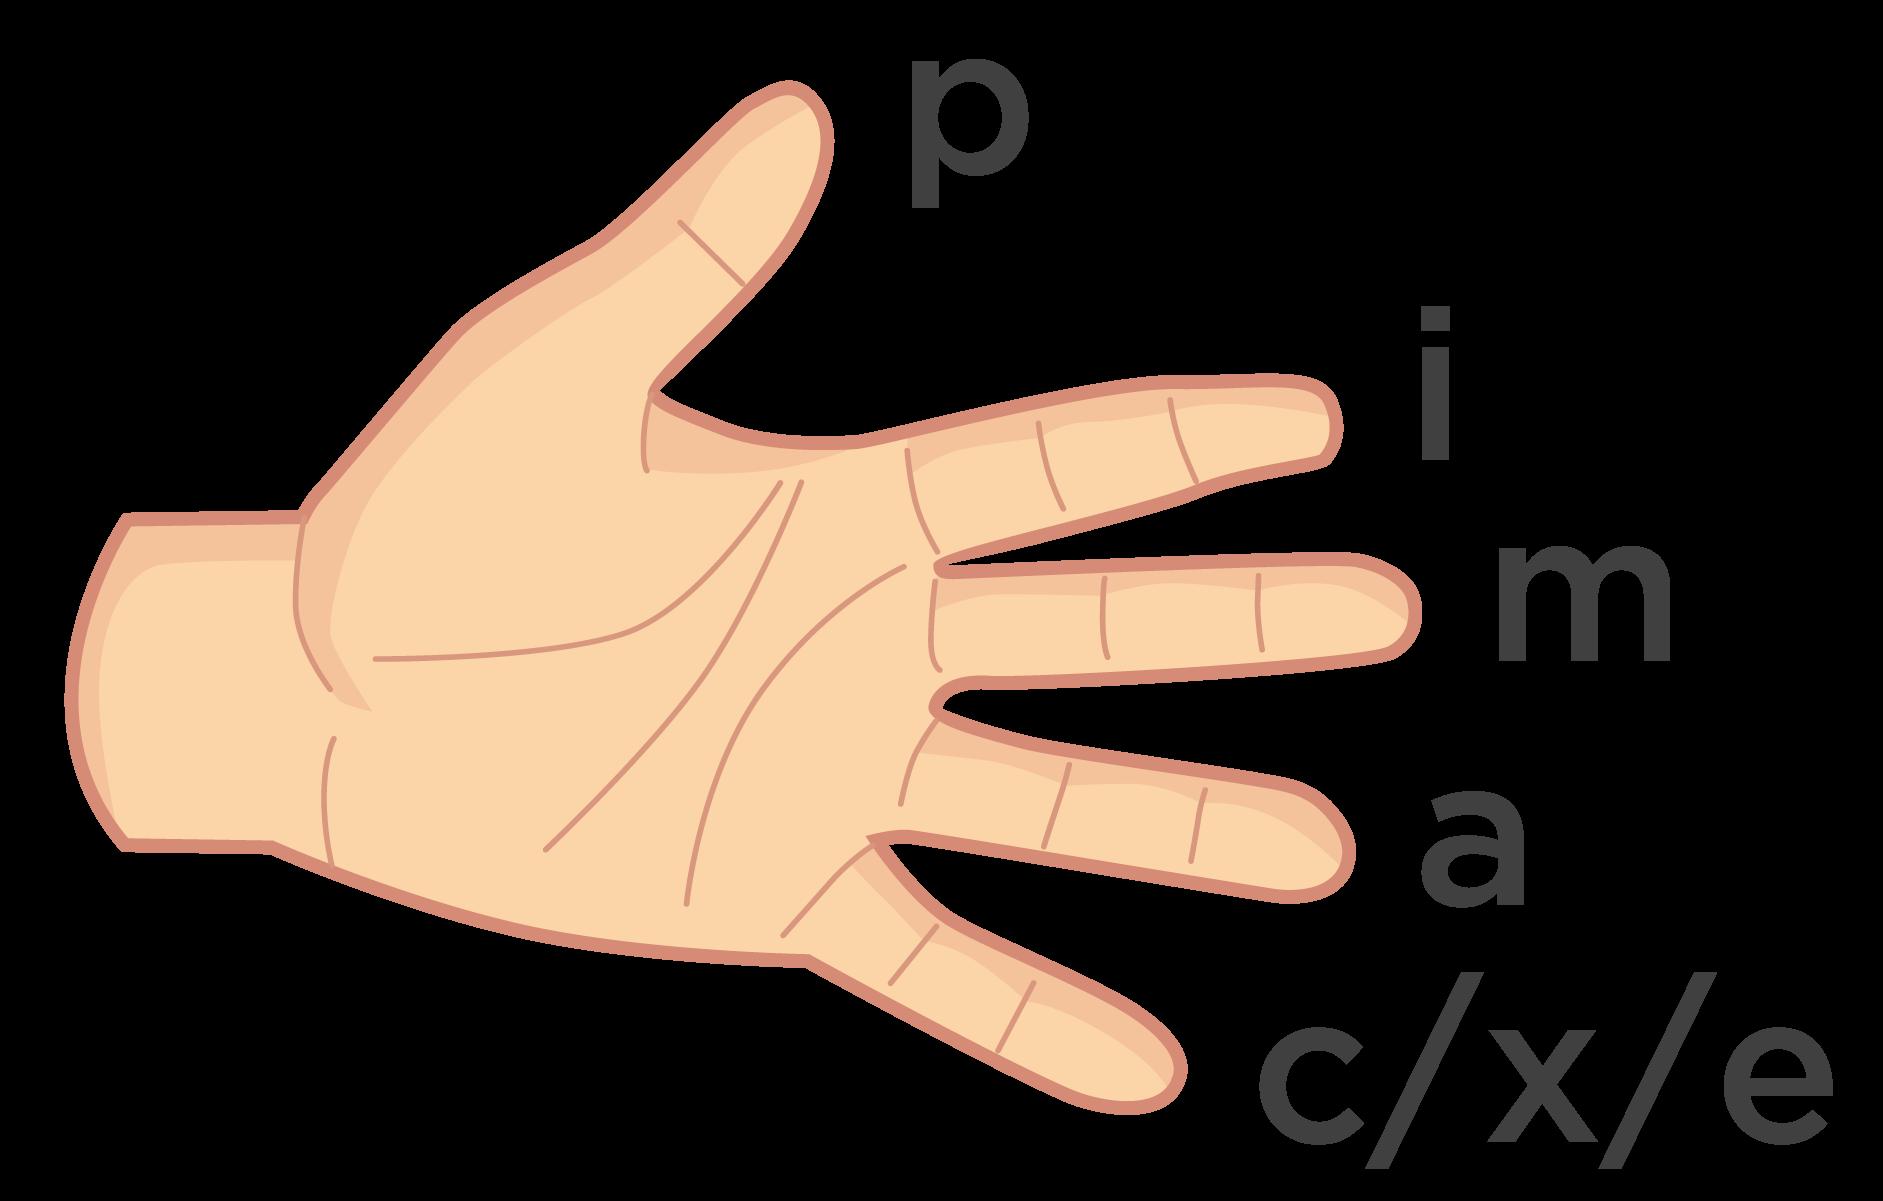 Finger selection